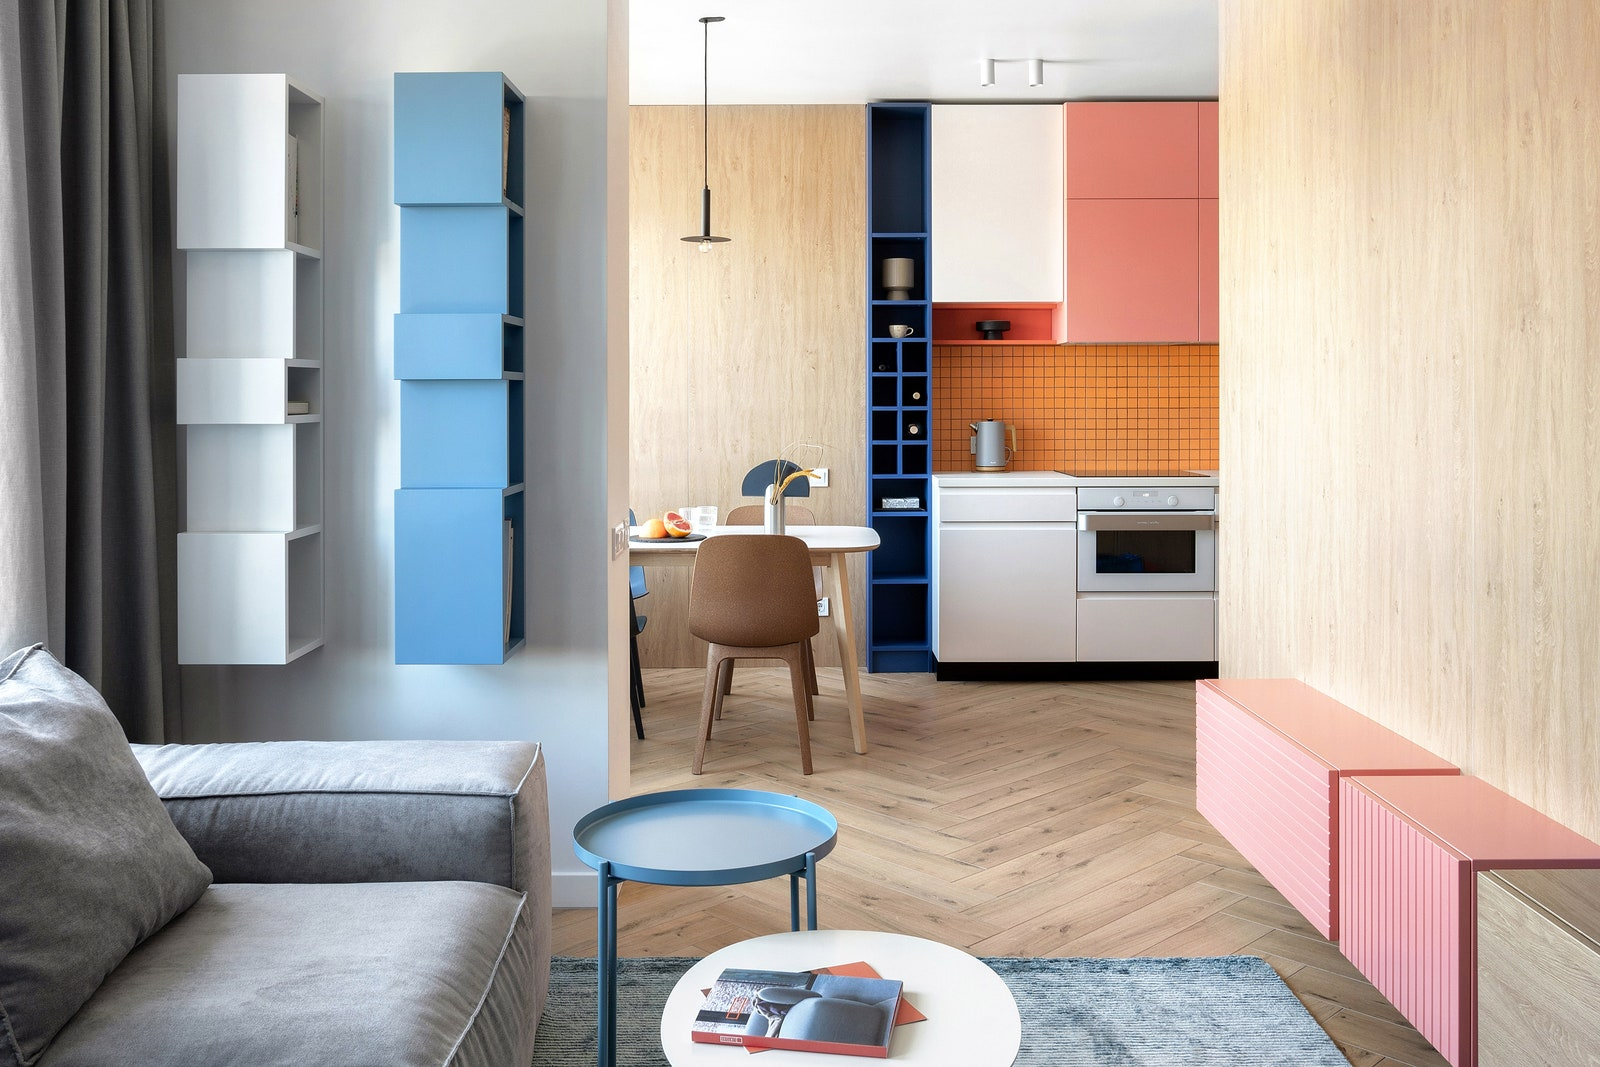 .    Interia  Ecocarpet    Woo Furniture     IKEA.           Rako.